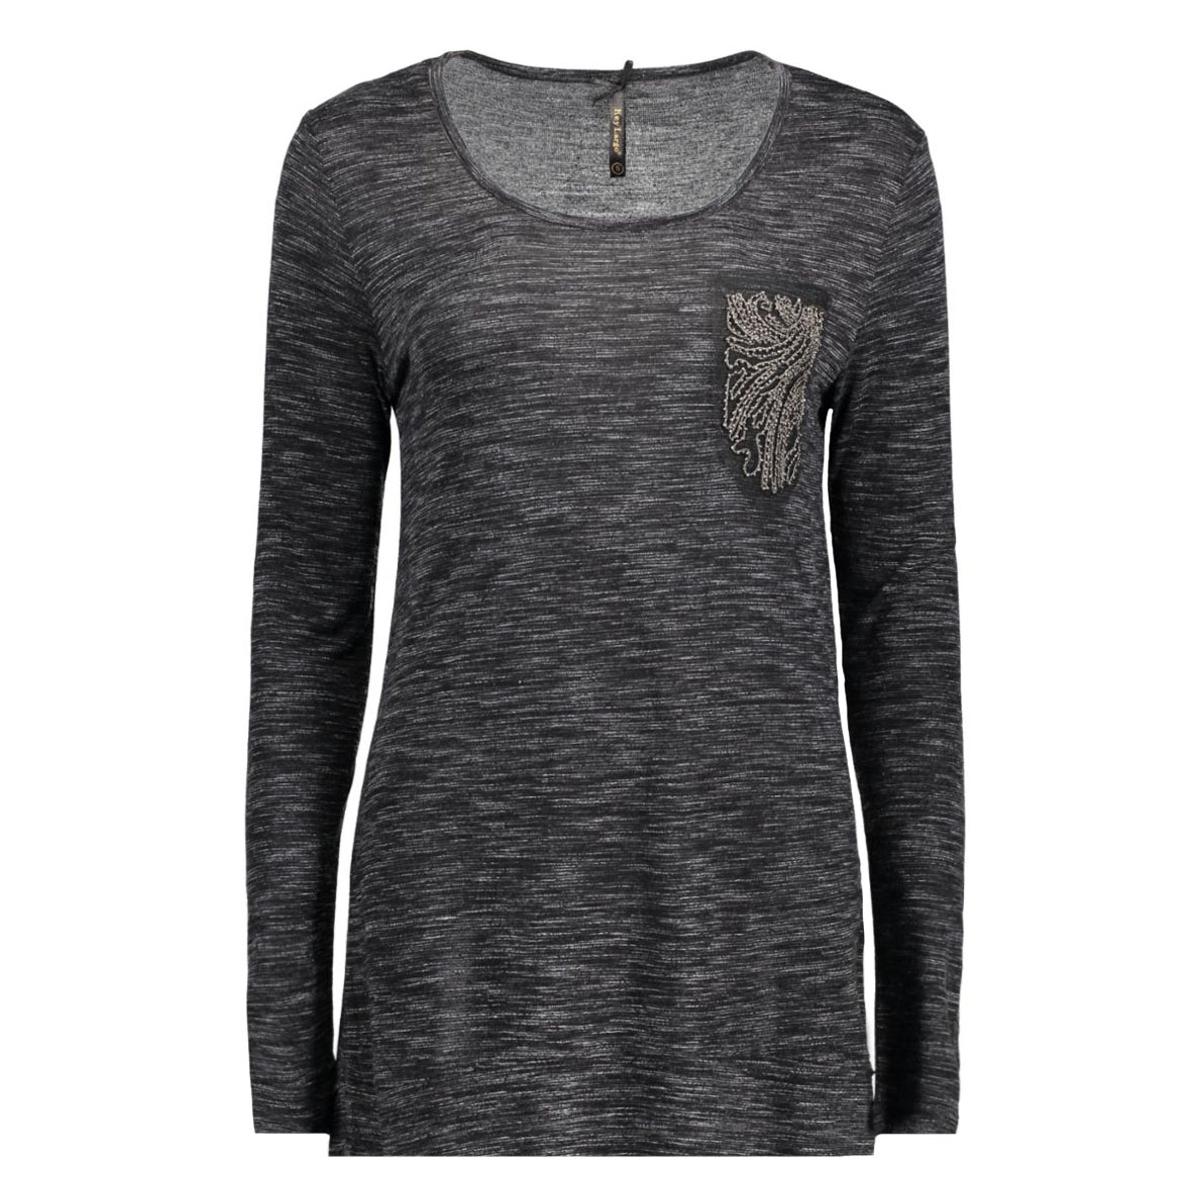 dls00281 key largo t-shirt black